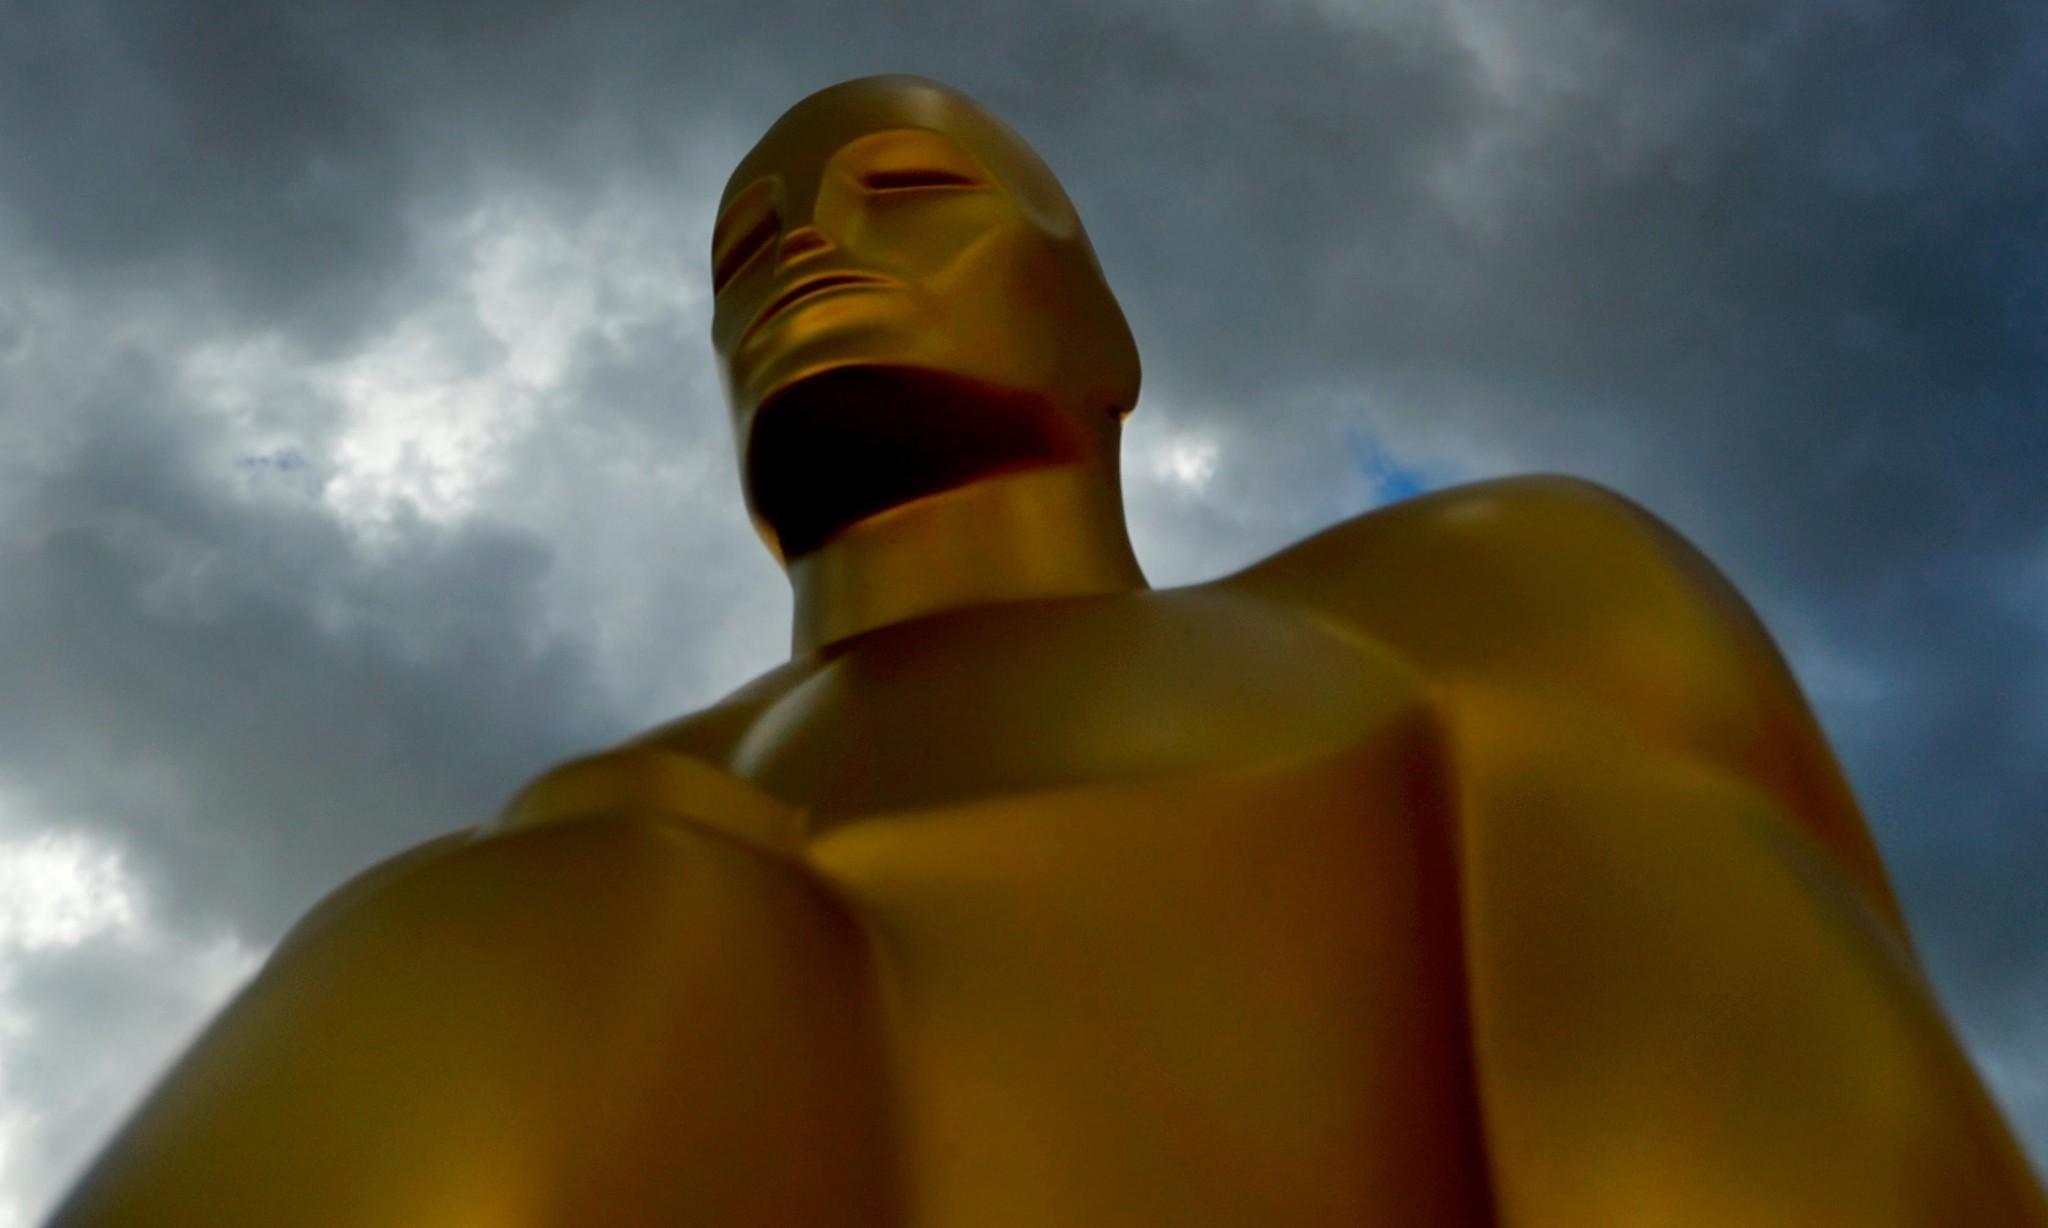 Oscar winners 2017: the full list